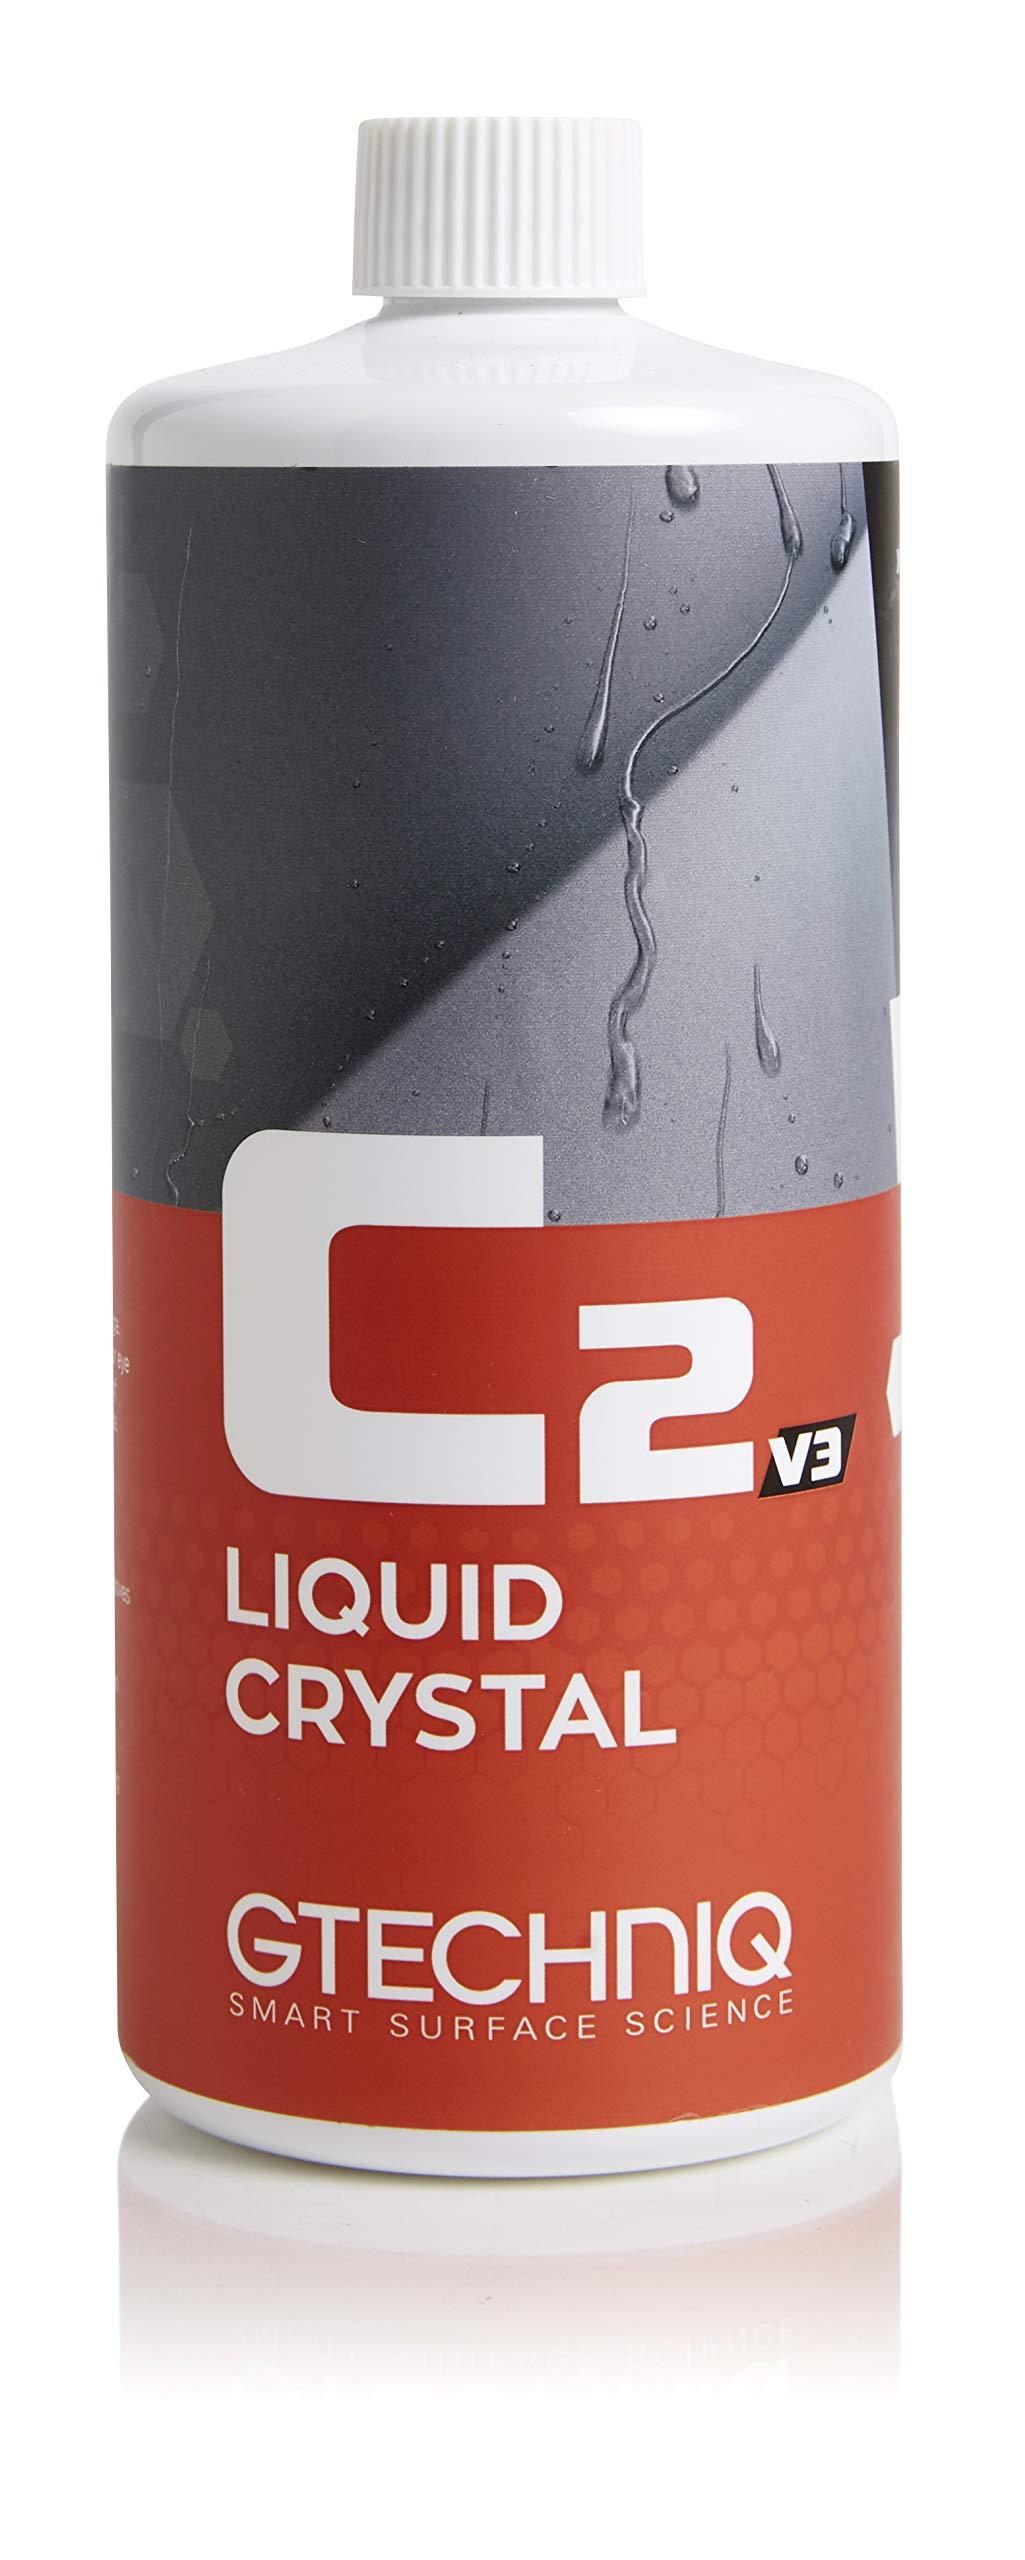 Gtechniq C2 Liquid Crystal v3 1000ml